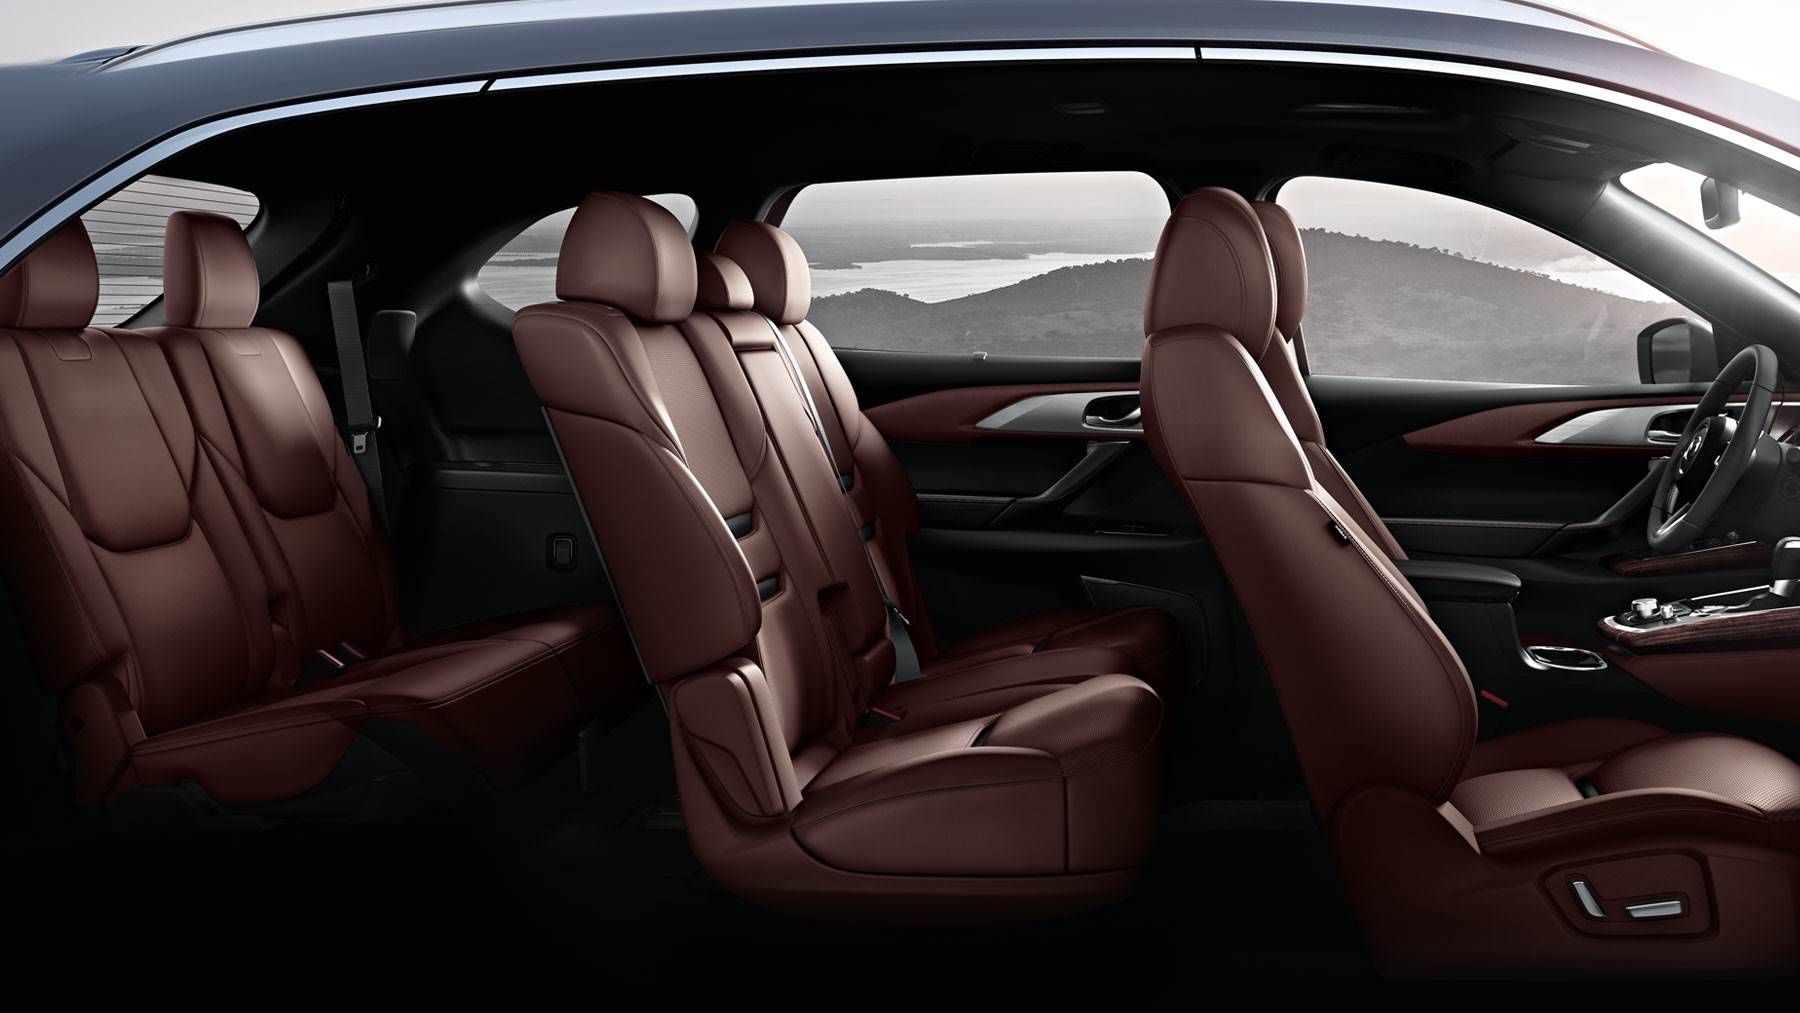 Spacious Interior of the 2018 Mazda CX-9